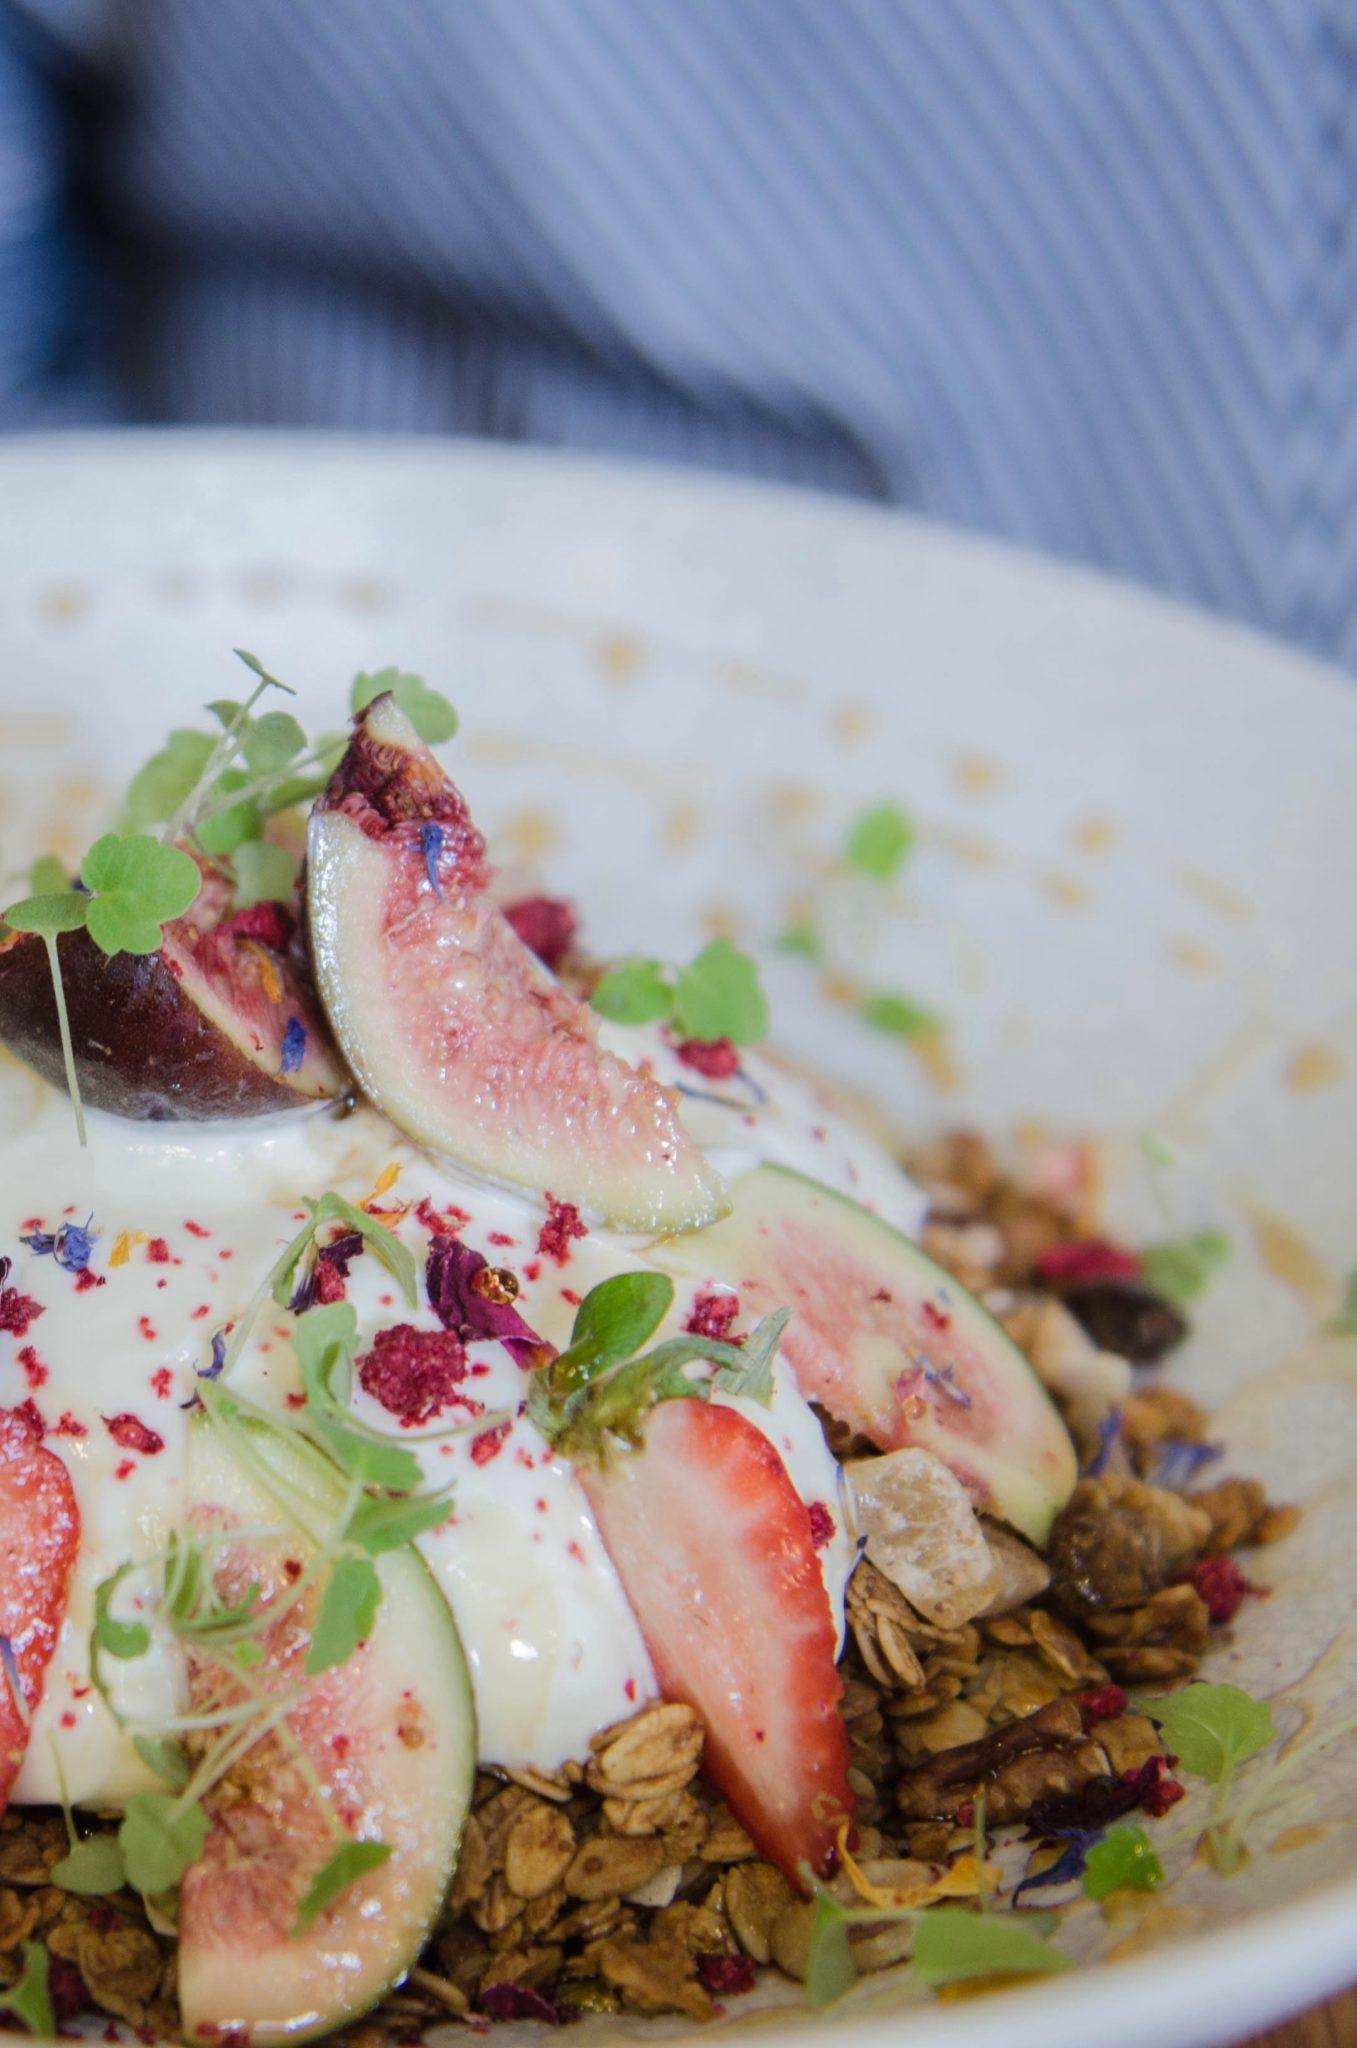 Redfern Sydney: Frühstücken kann man besonders gut in Rabbit Hole Organic Tea Bar